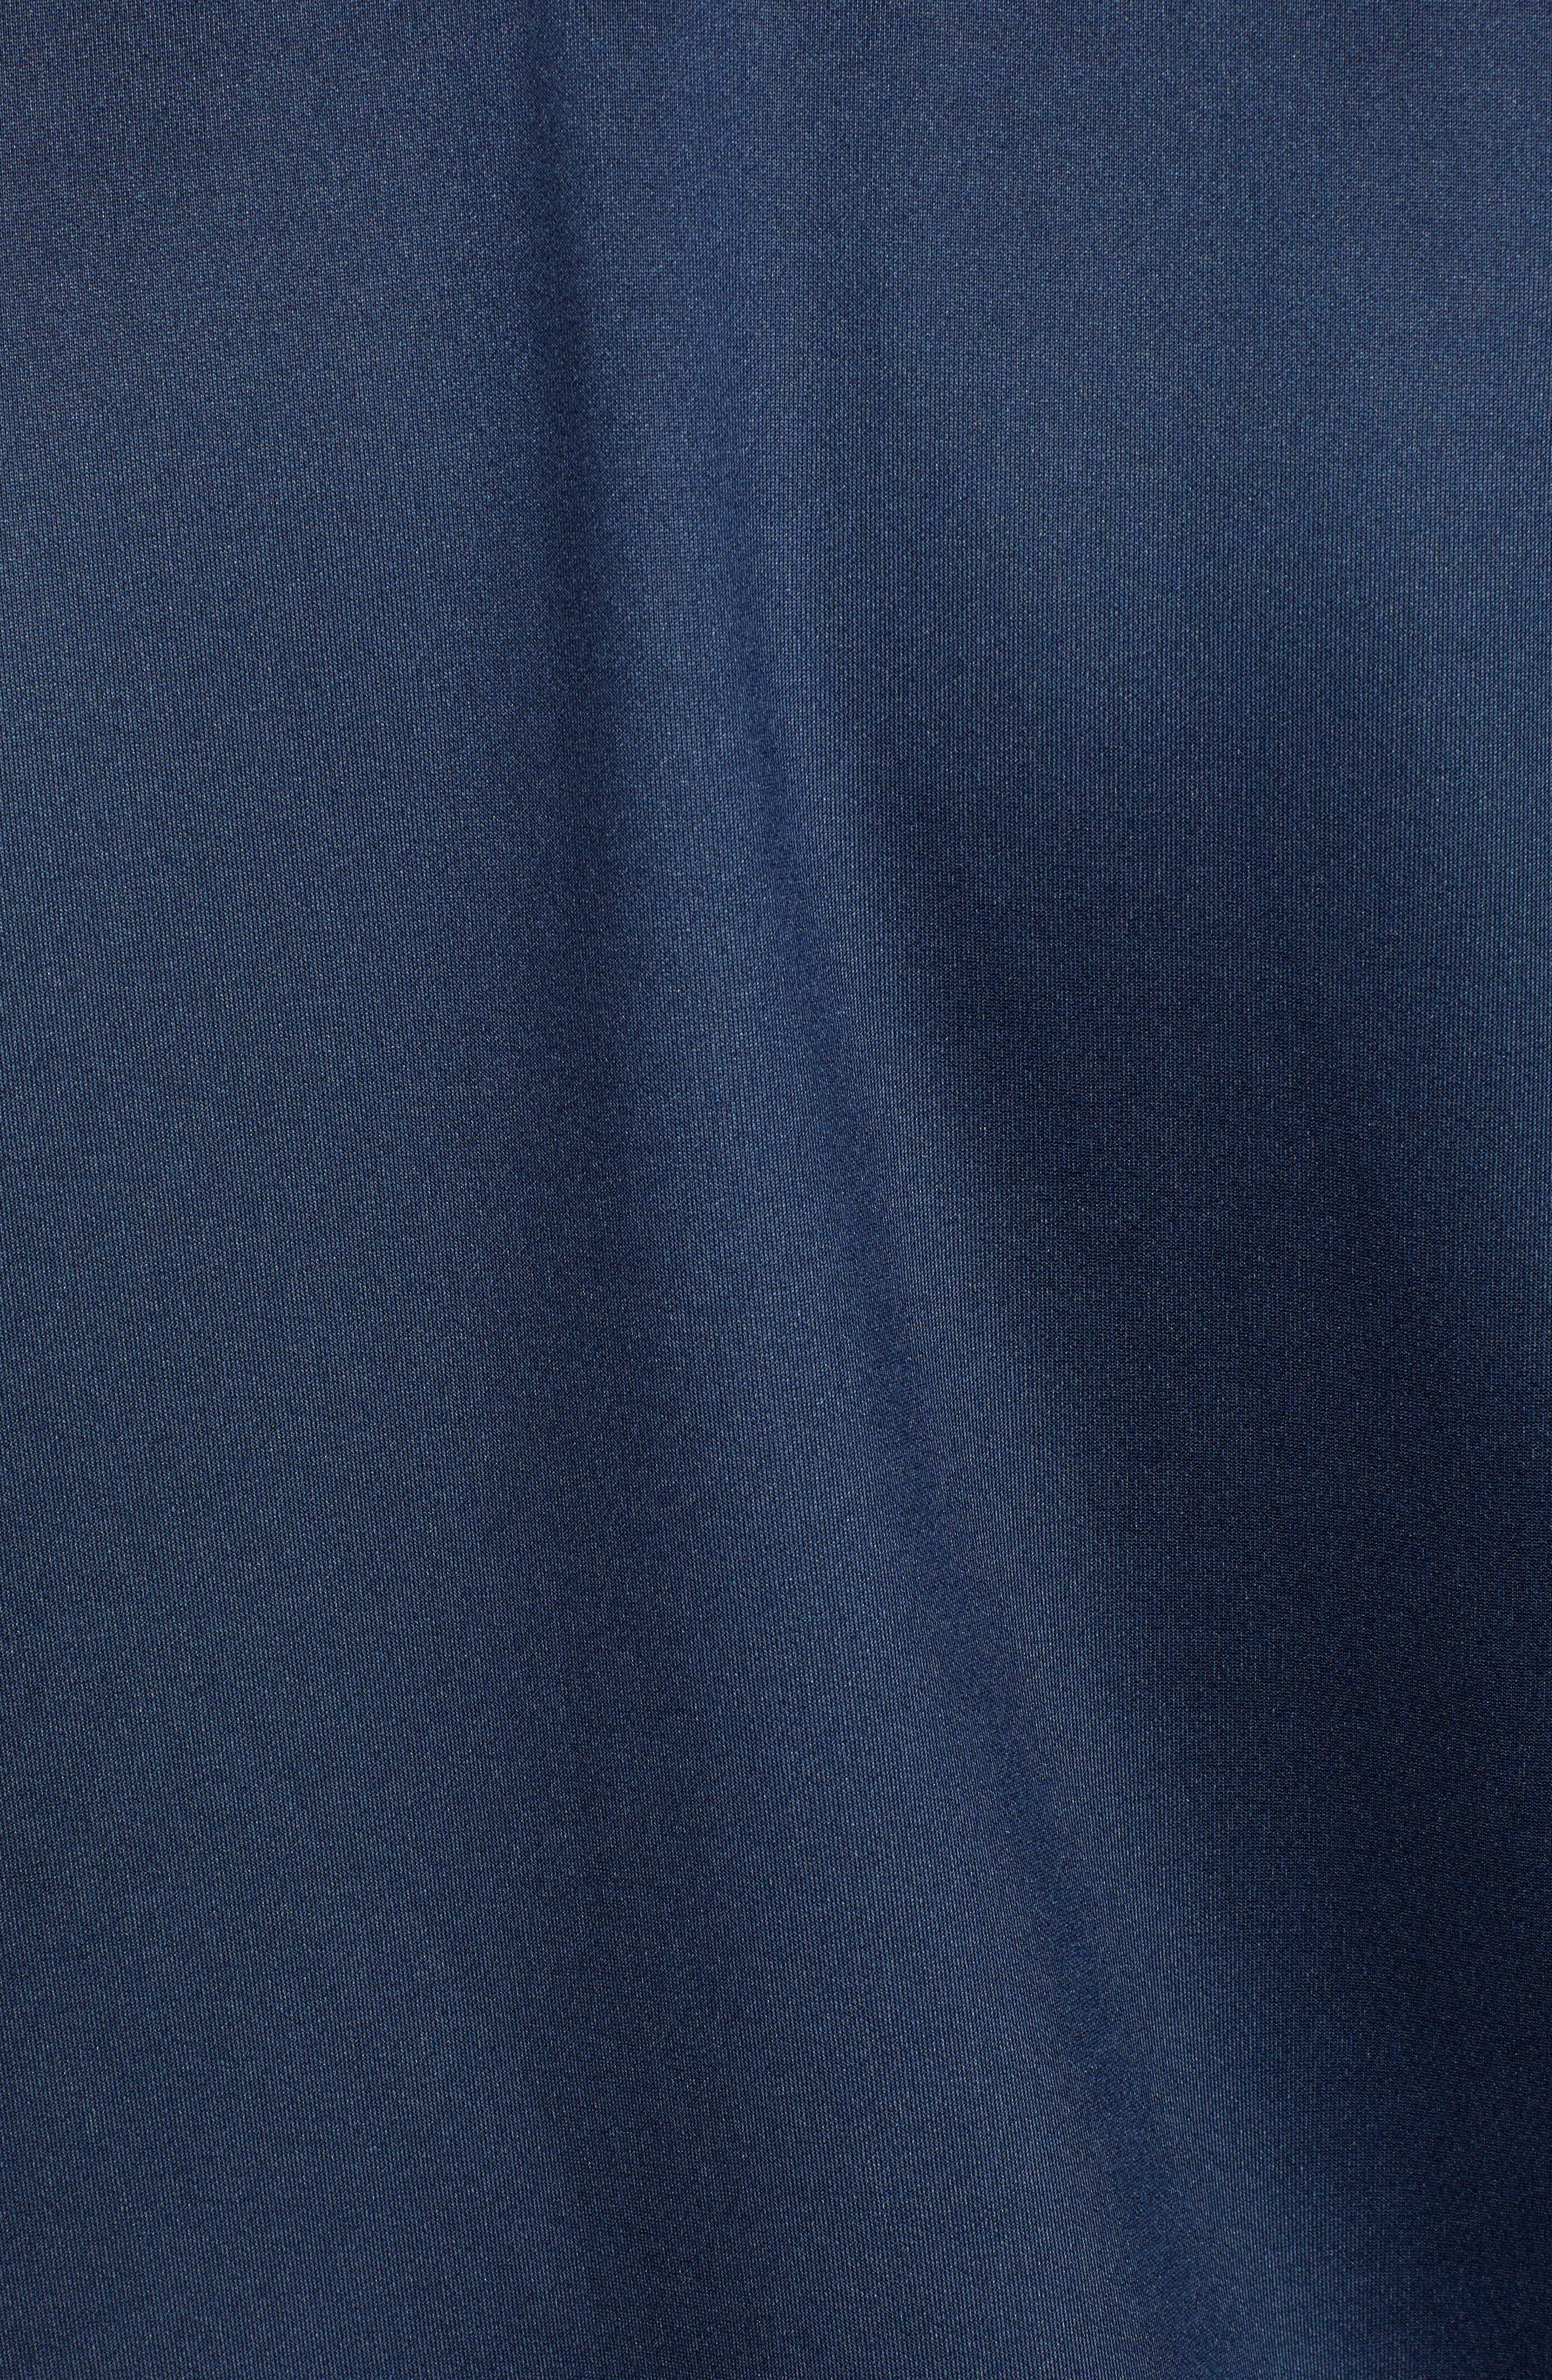 Metallic Stripe Track Jacket,                             Alternate thumbnail 7, color,                             NAVY